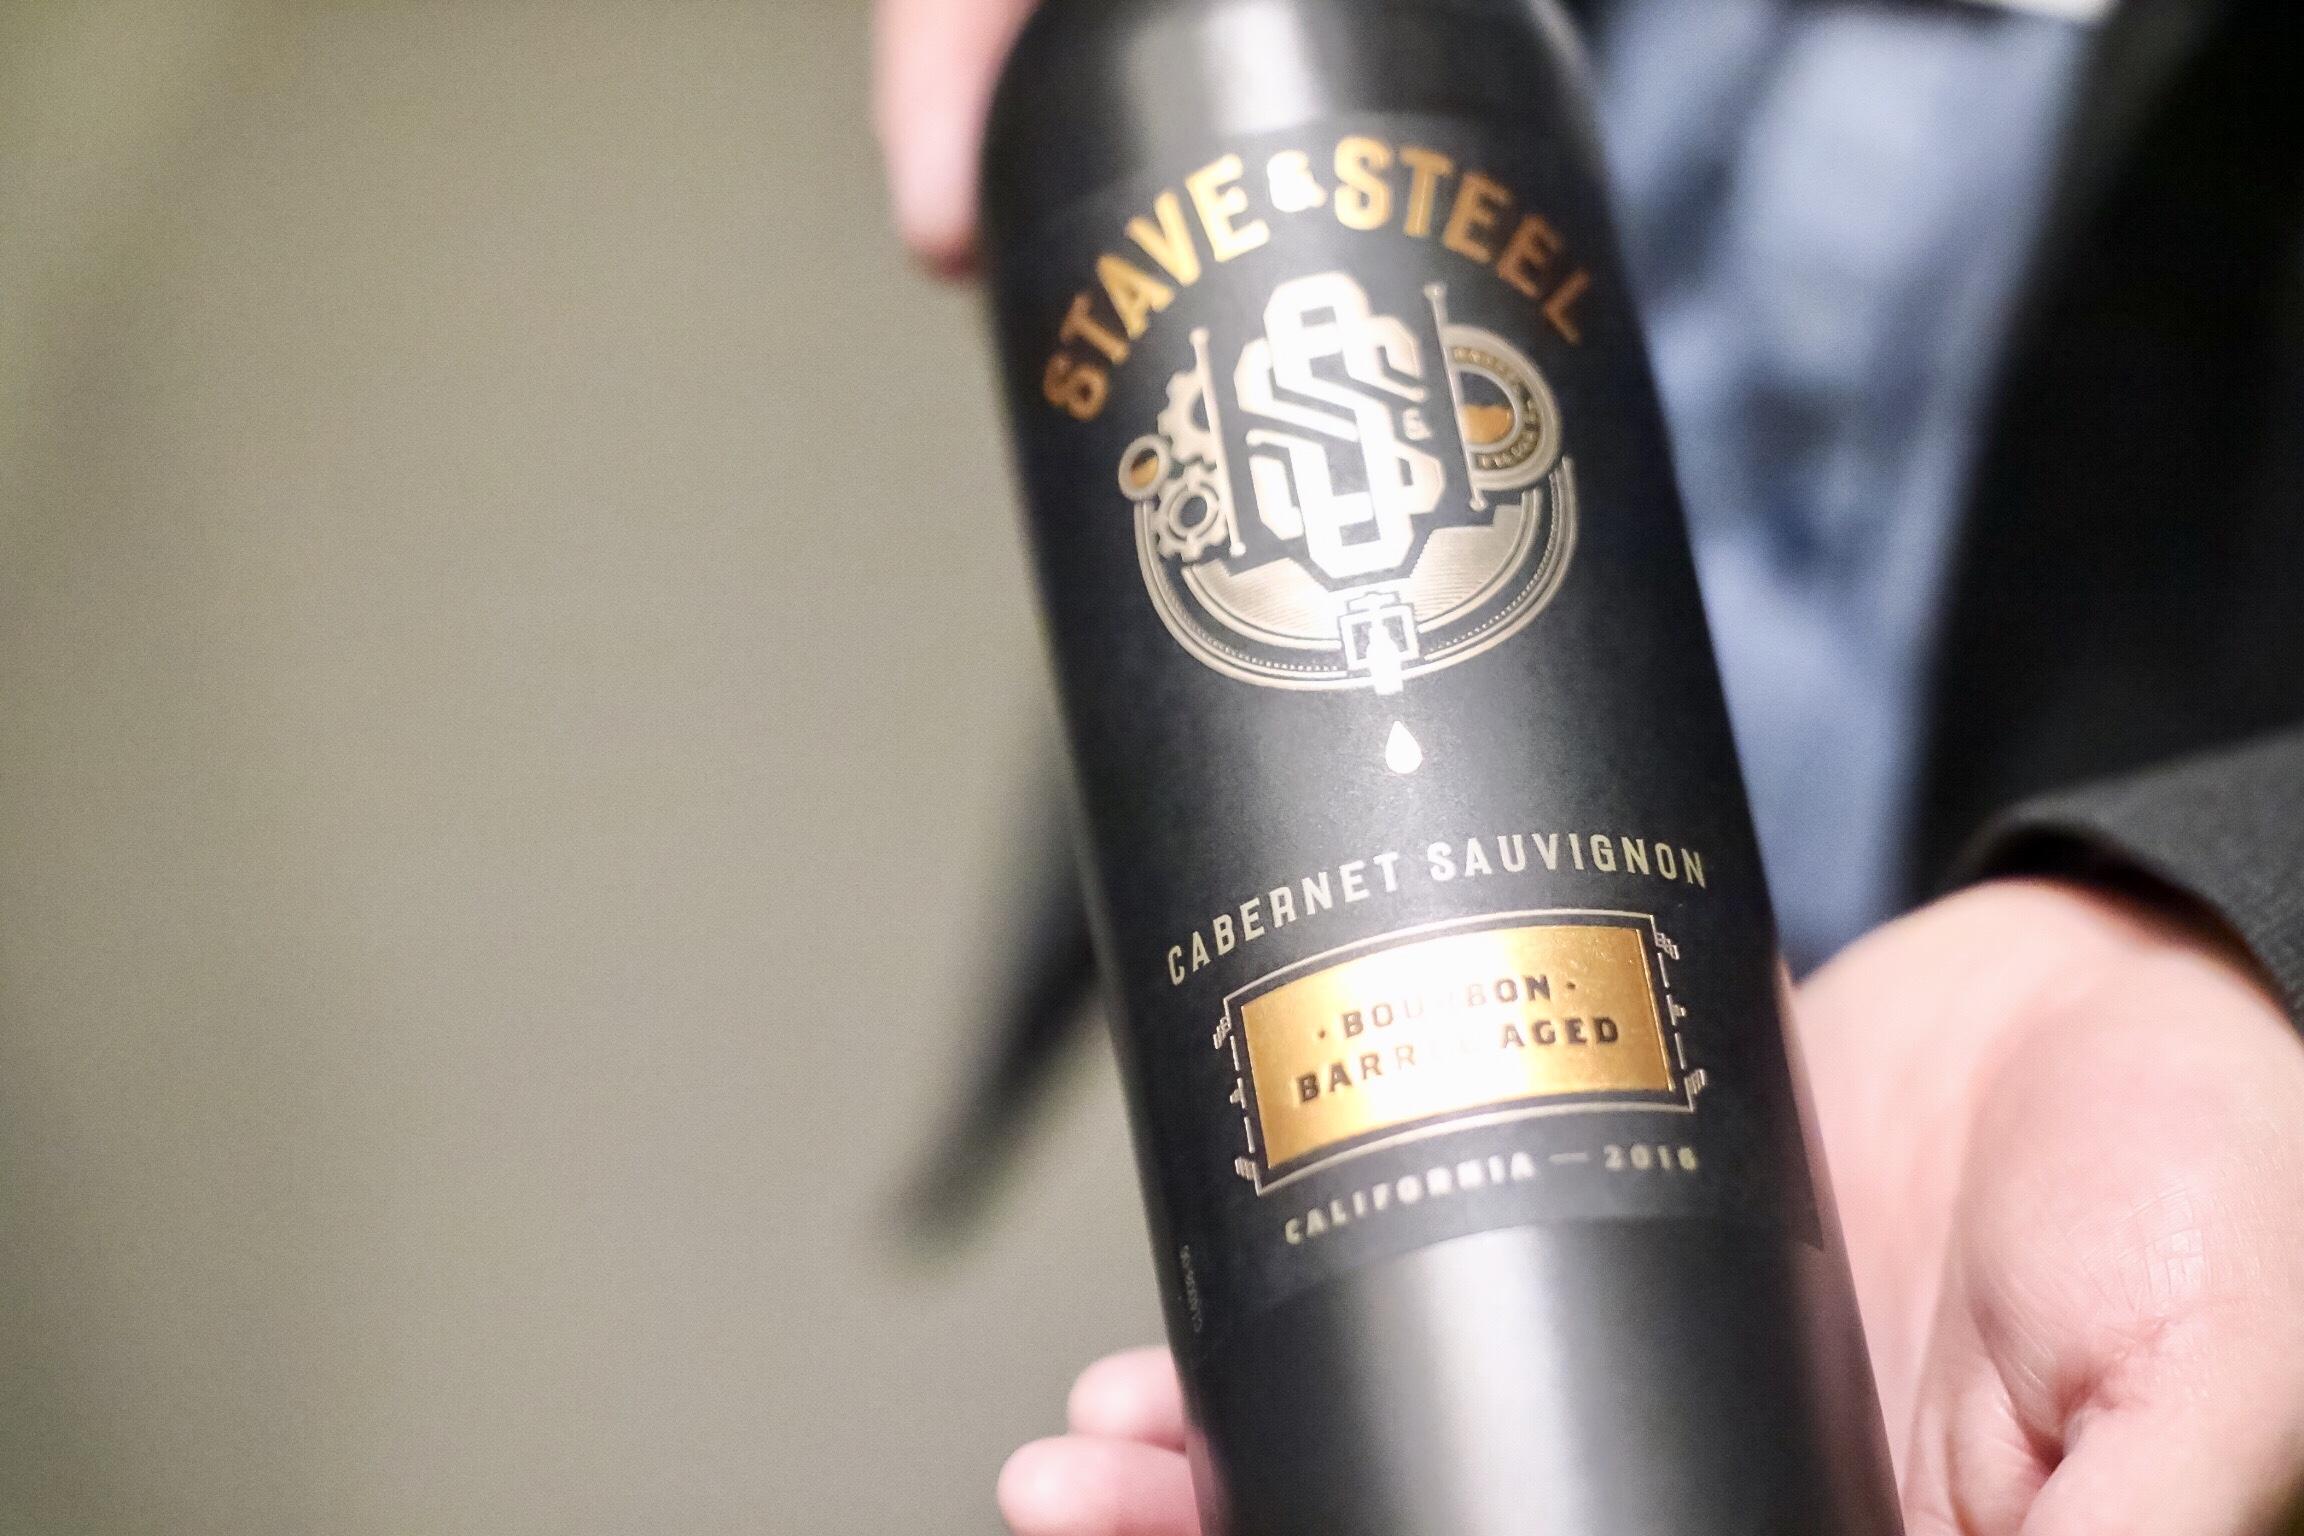 Stave & Steel Cabernet Sauvignon